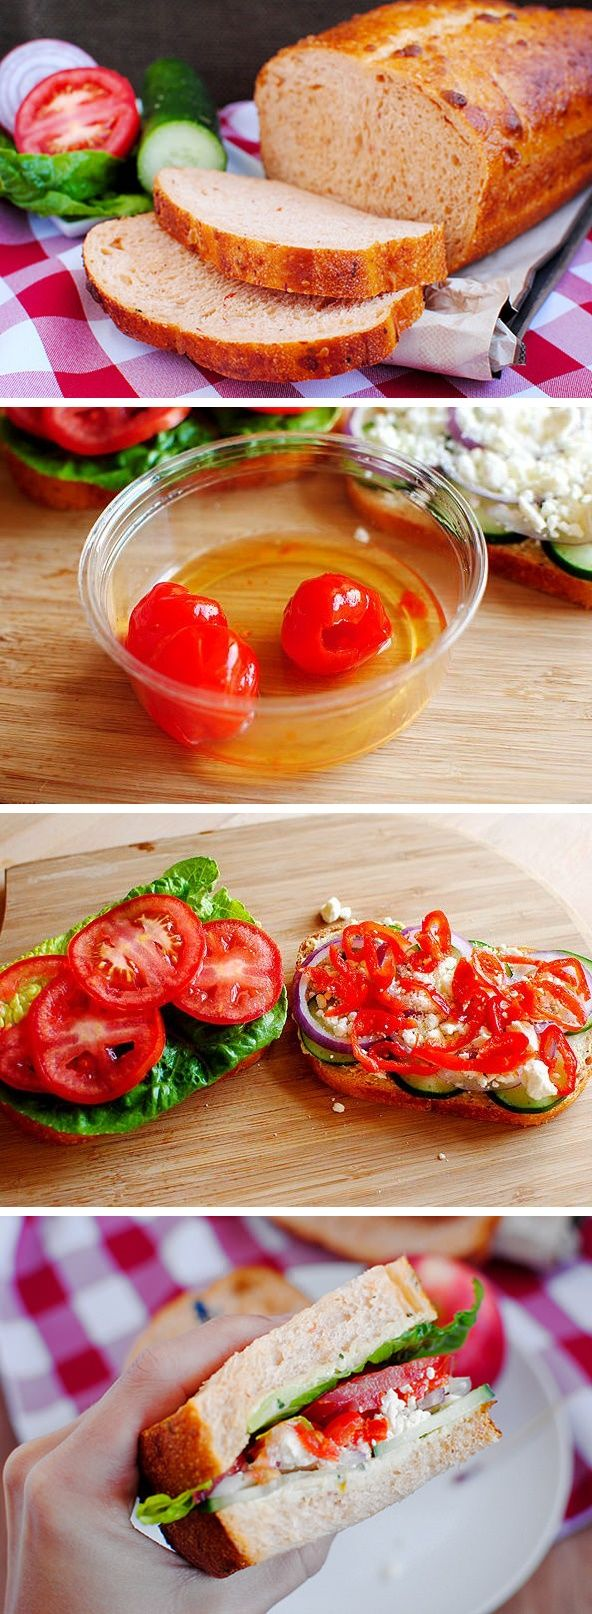 Copycat Panera Mediterranean Veggie Sandwich Recipe + 5 Tips to Build a Better Sandwich